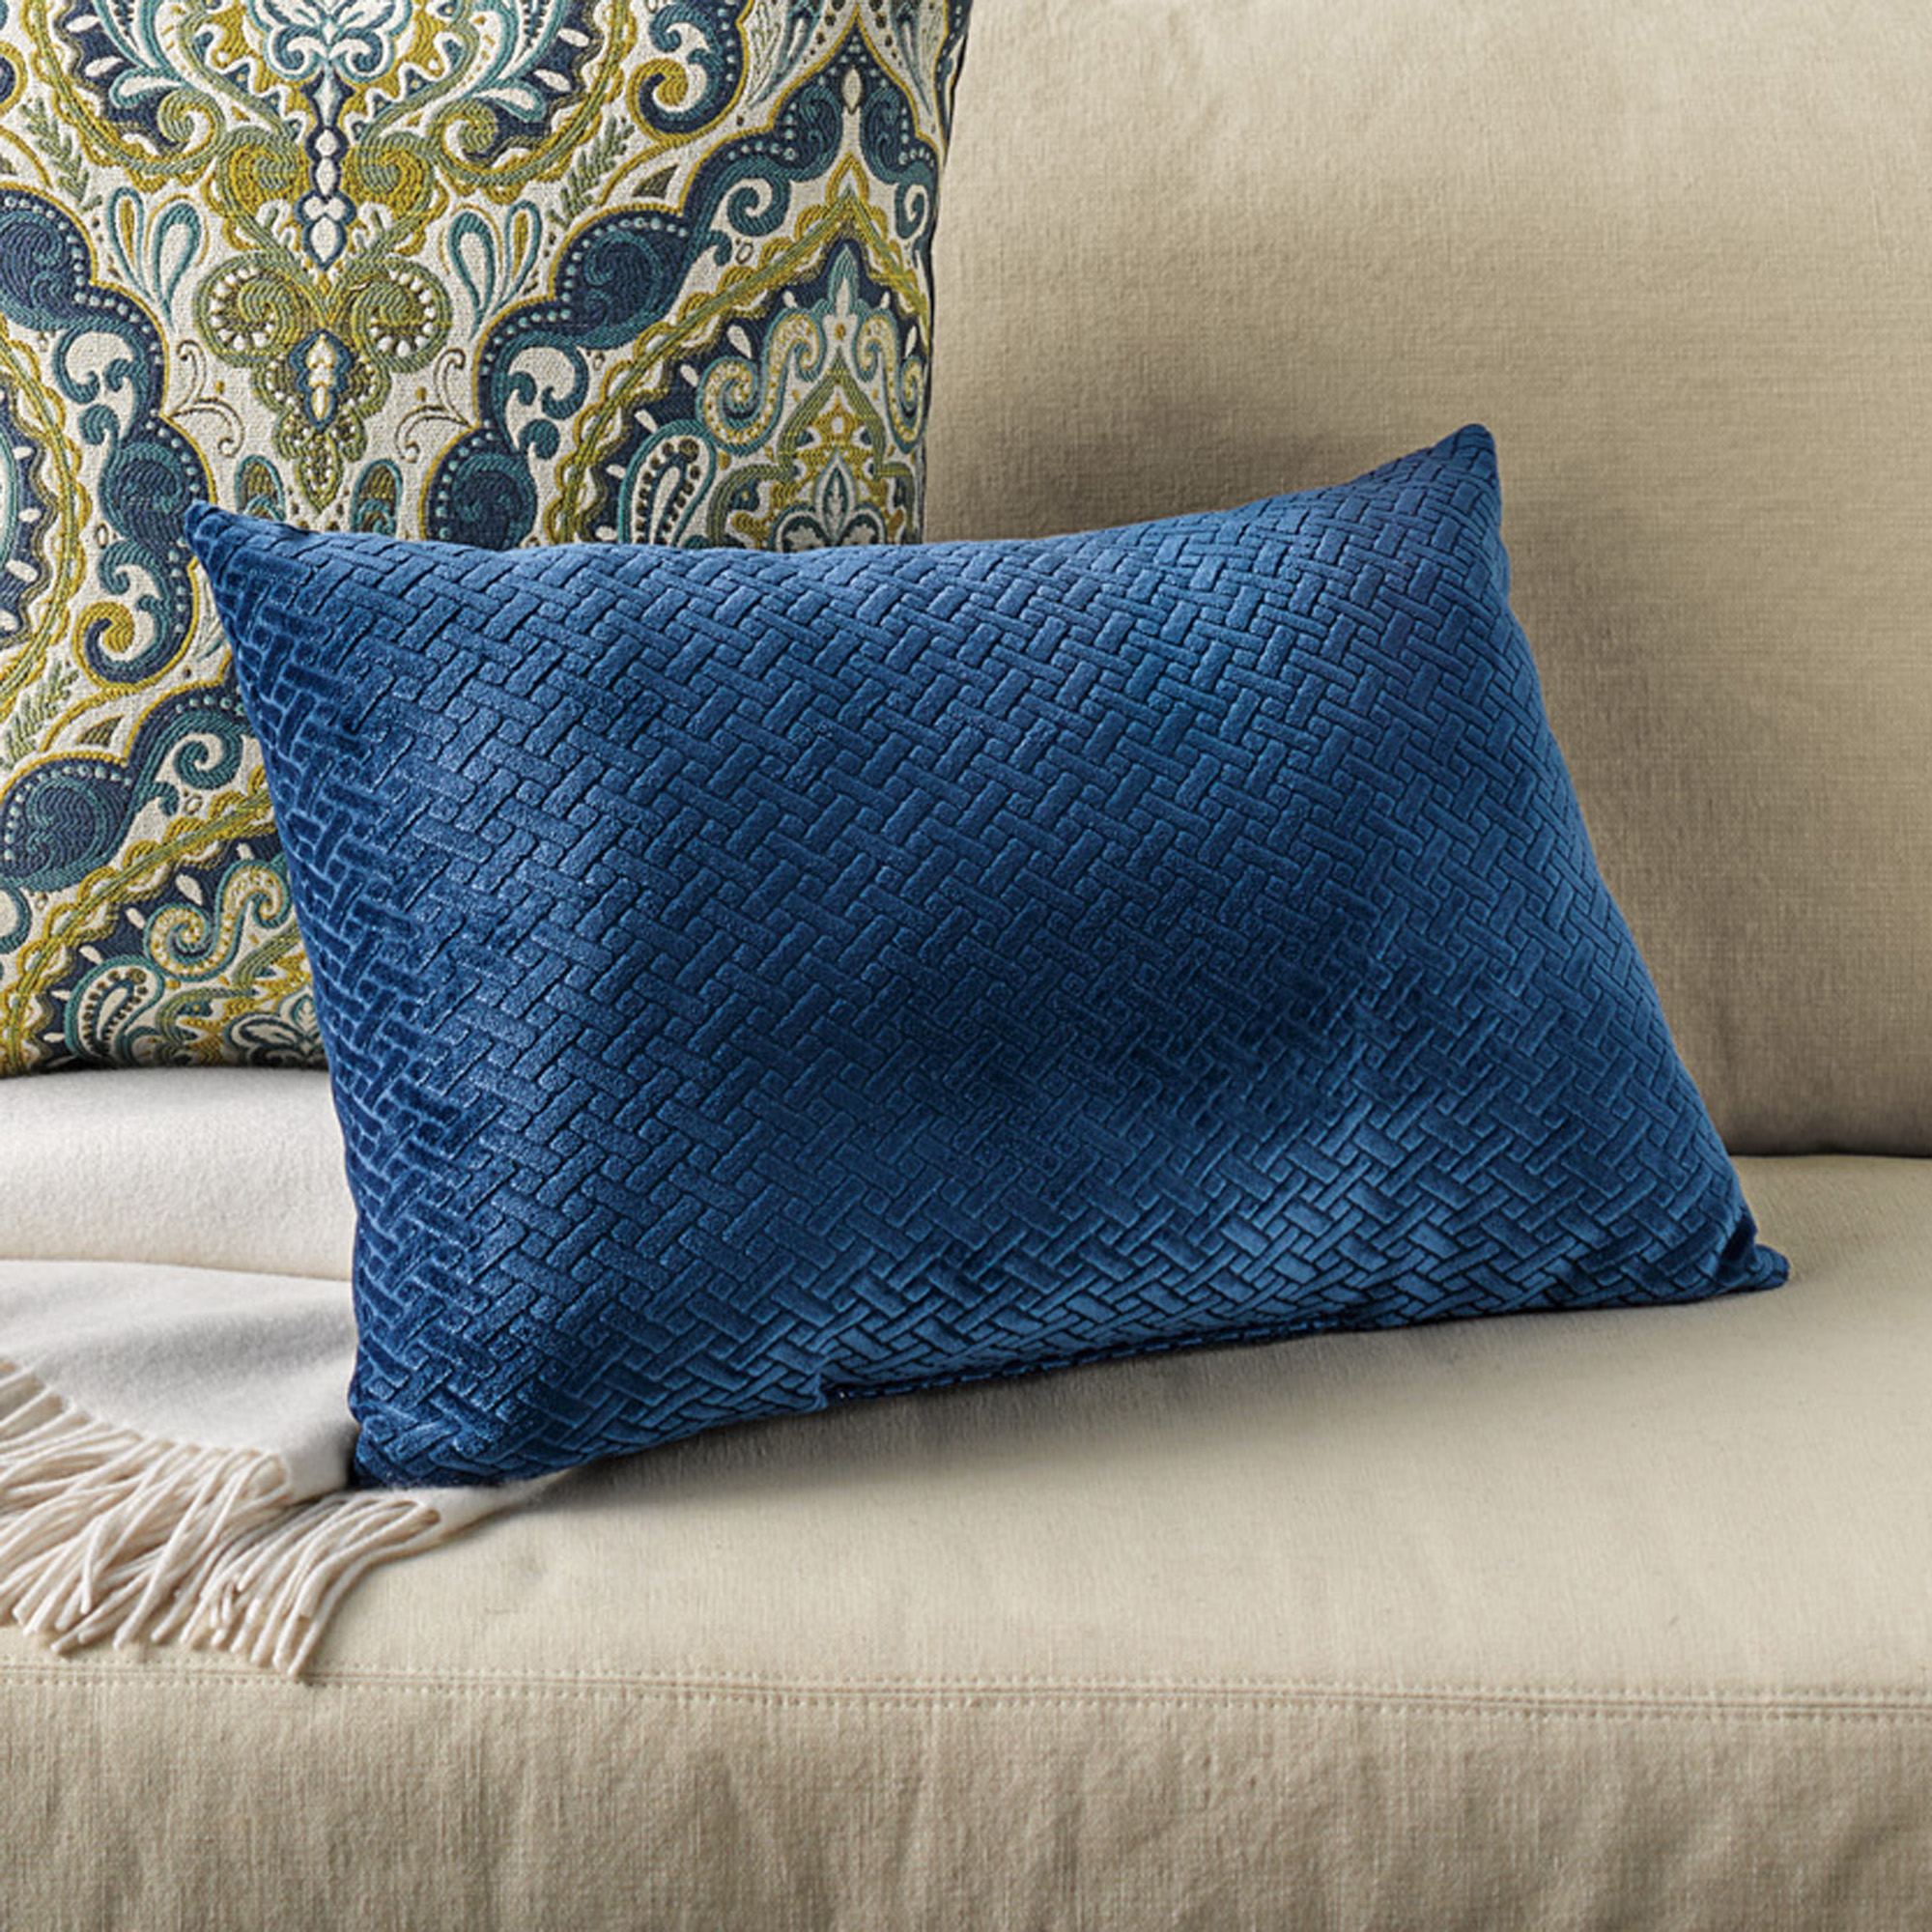 Throw Pillows Home : Chevron Lumbar Pillow Gump s